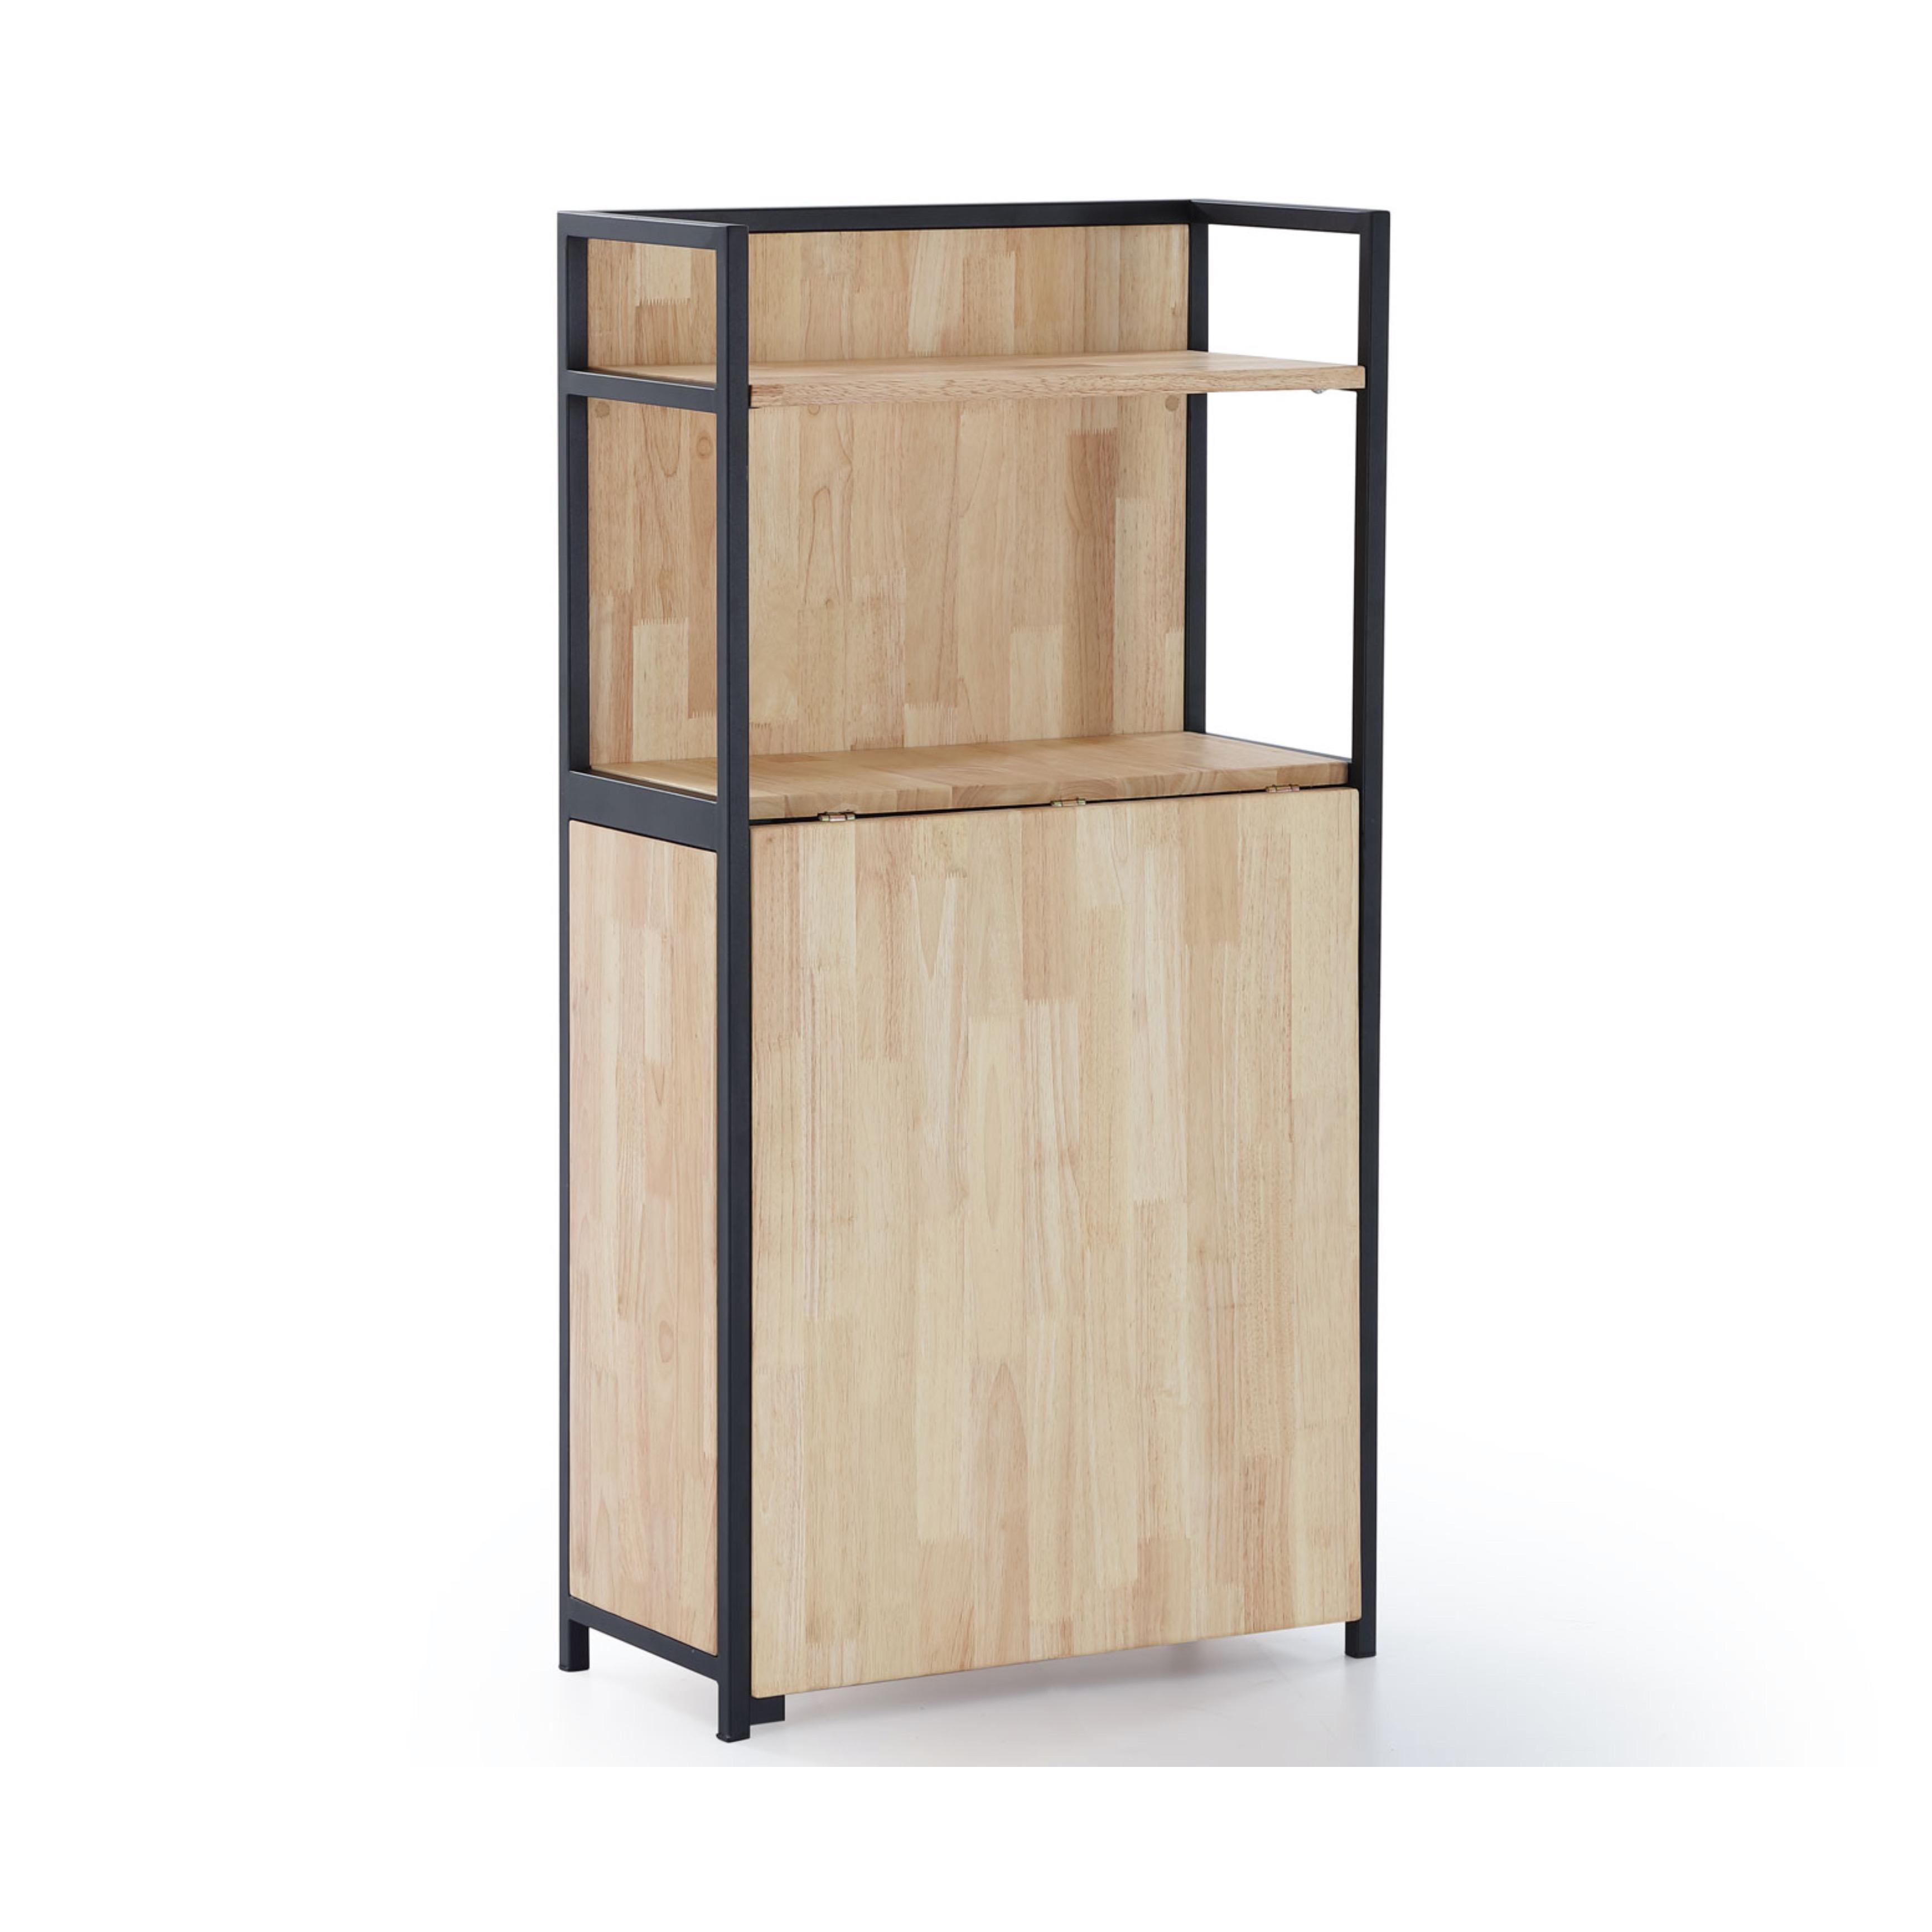 29595-estanteria-con-mesa-plegable-roble-1.jpeg